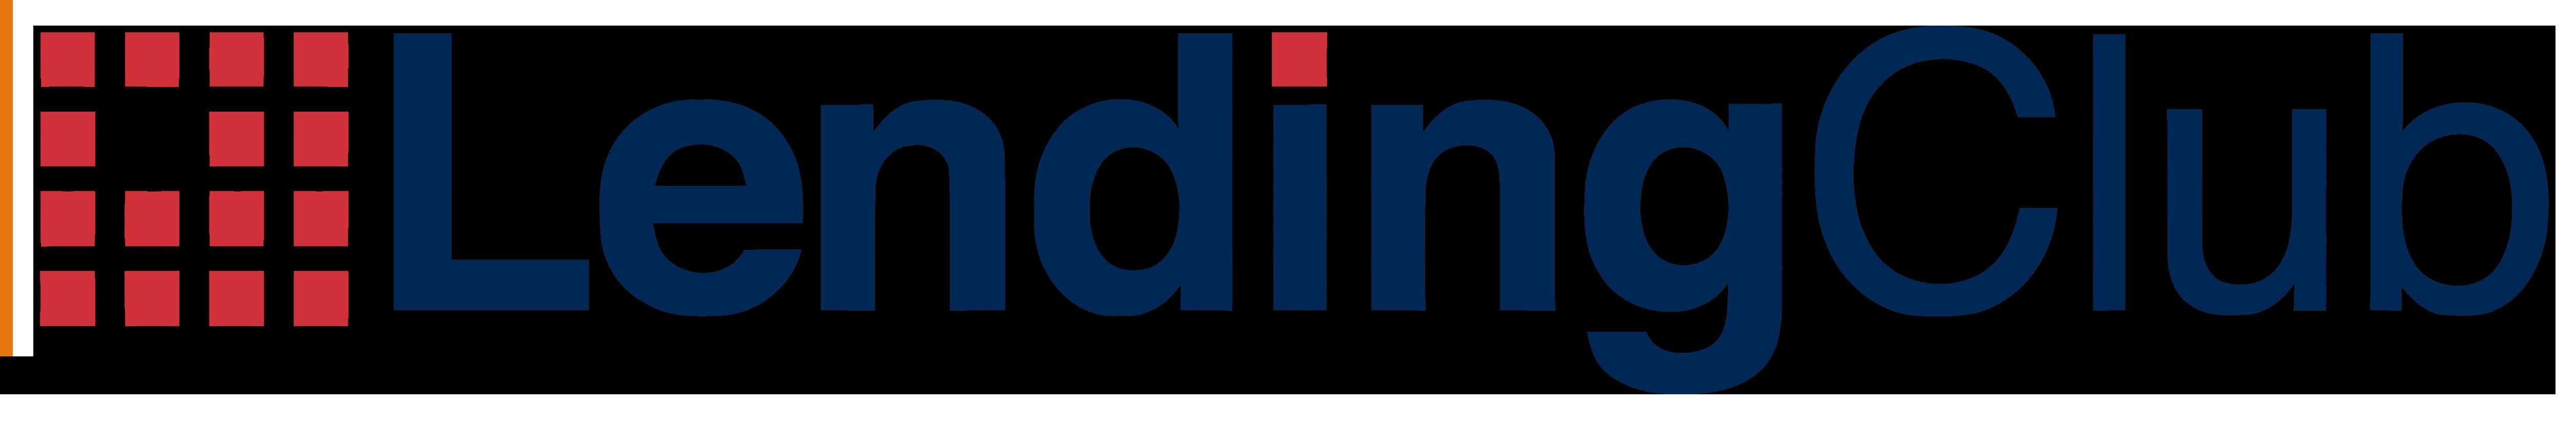 Lending_Club_logo